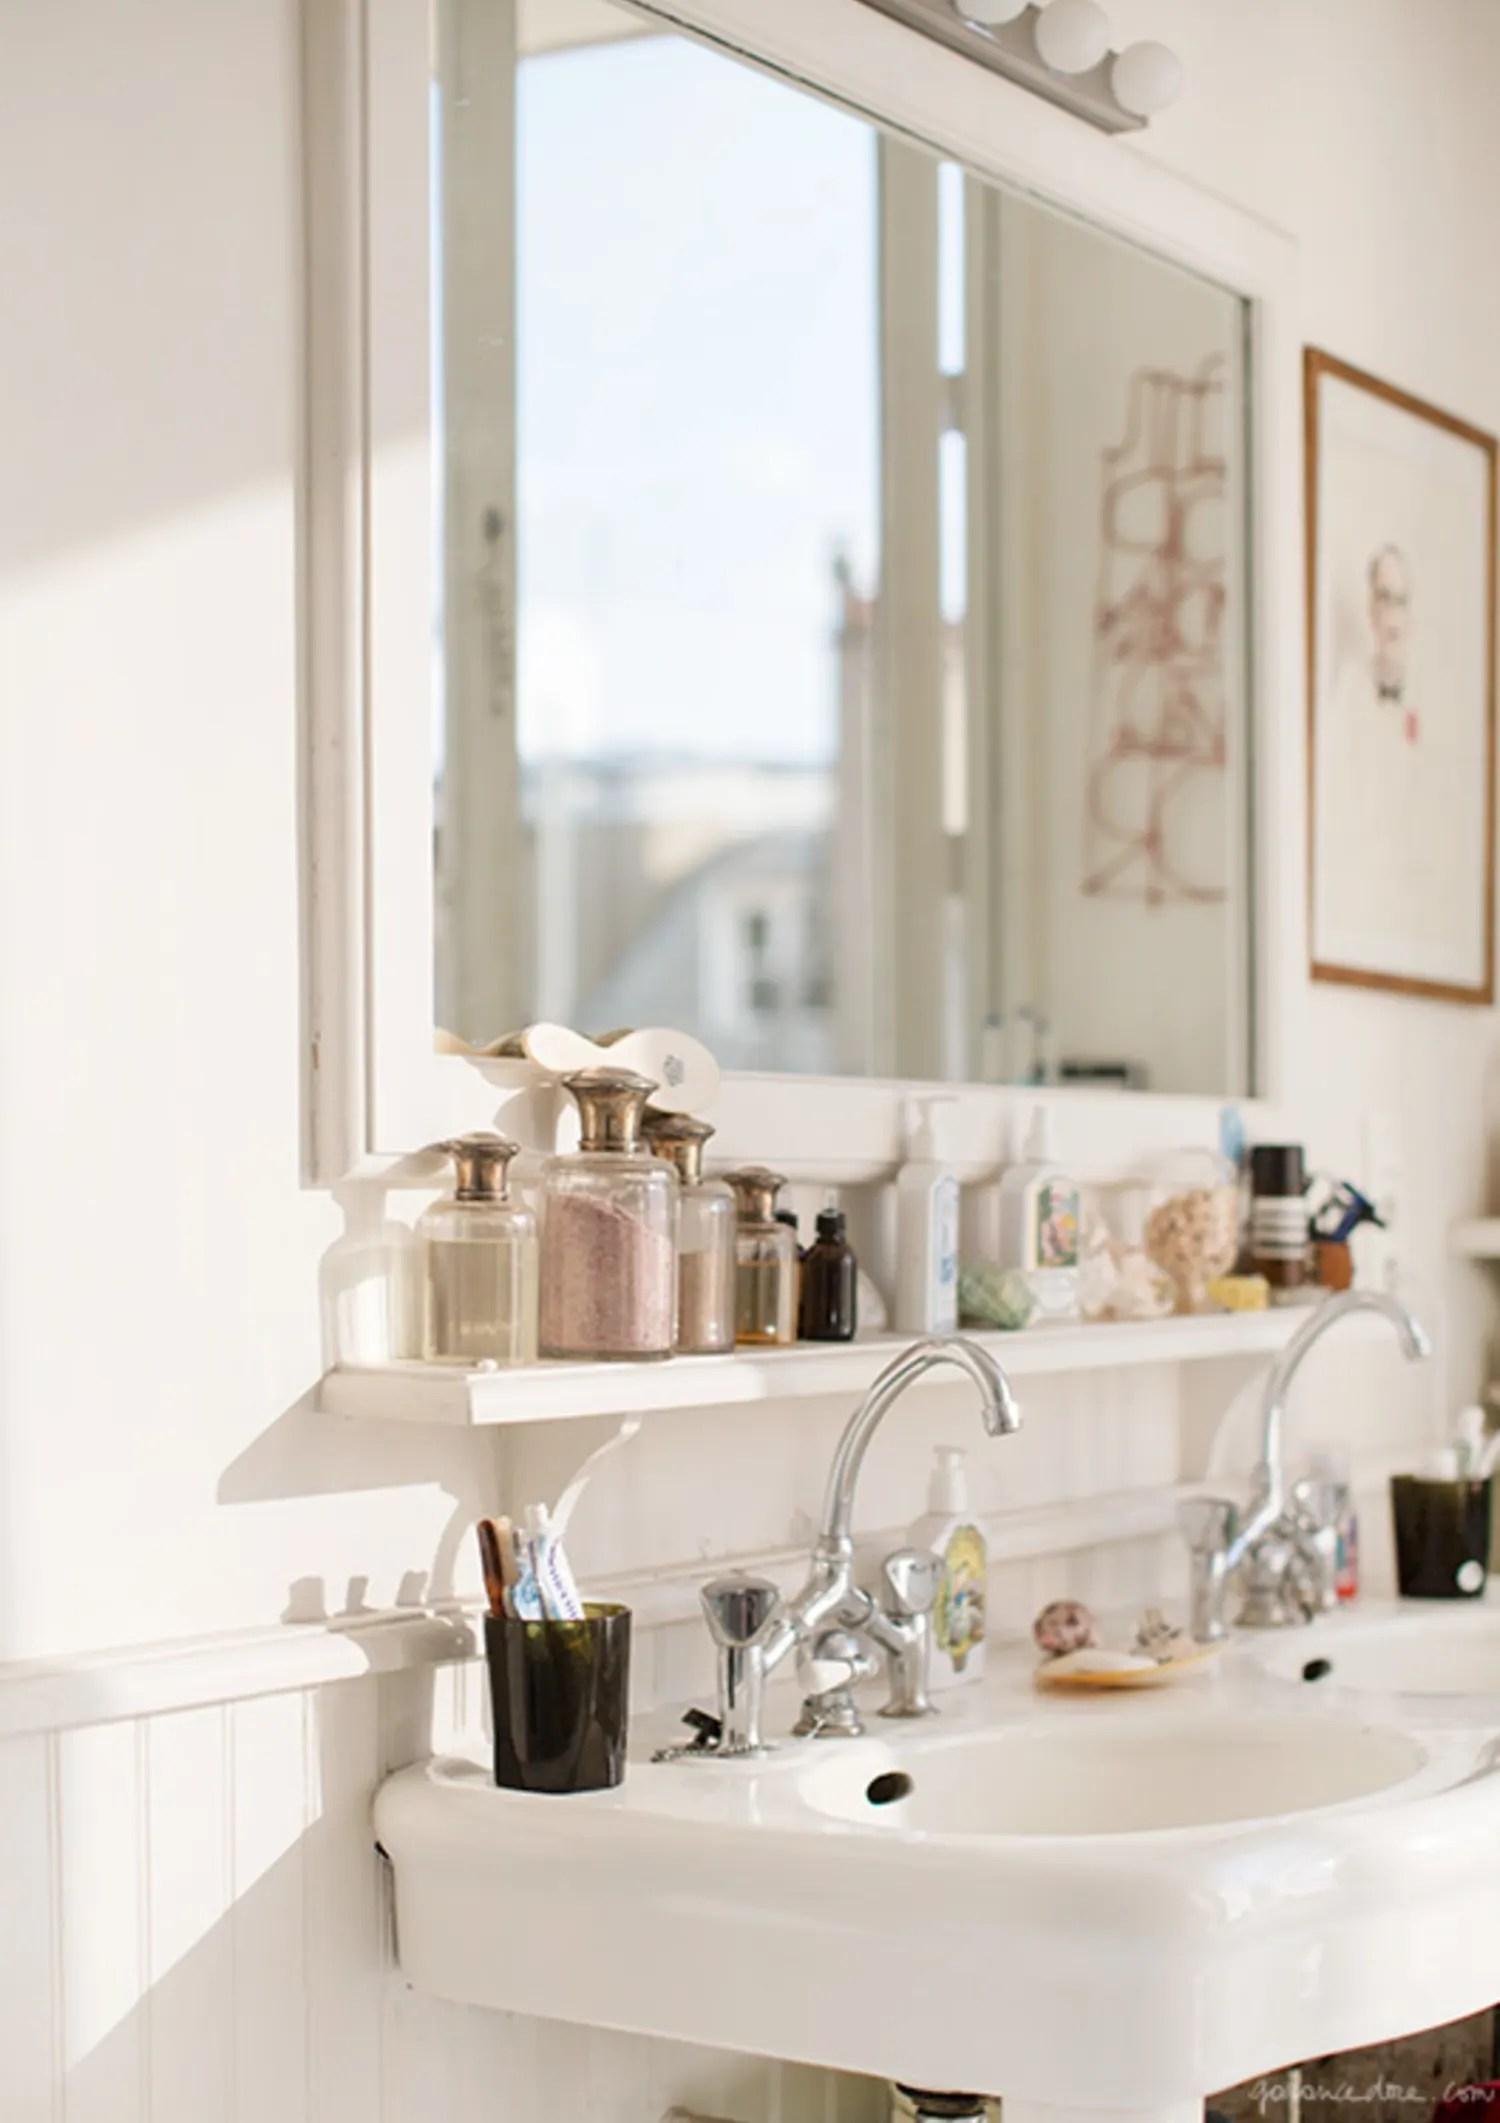 Small Bathroom Best Wall Shelves Storage Ideas | Apartment ... on Small Apartment Bathroom Storage Ideas  id=72392